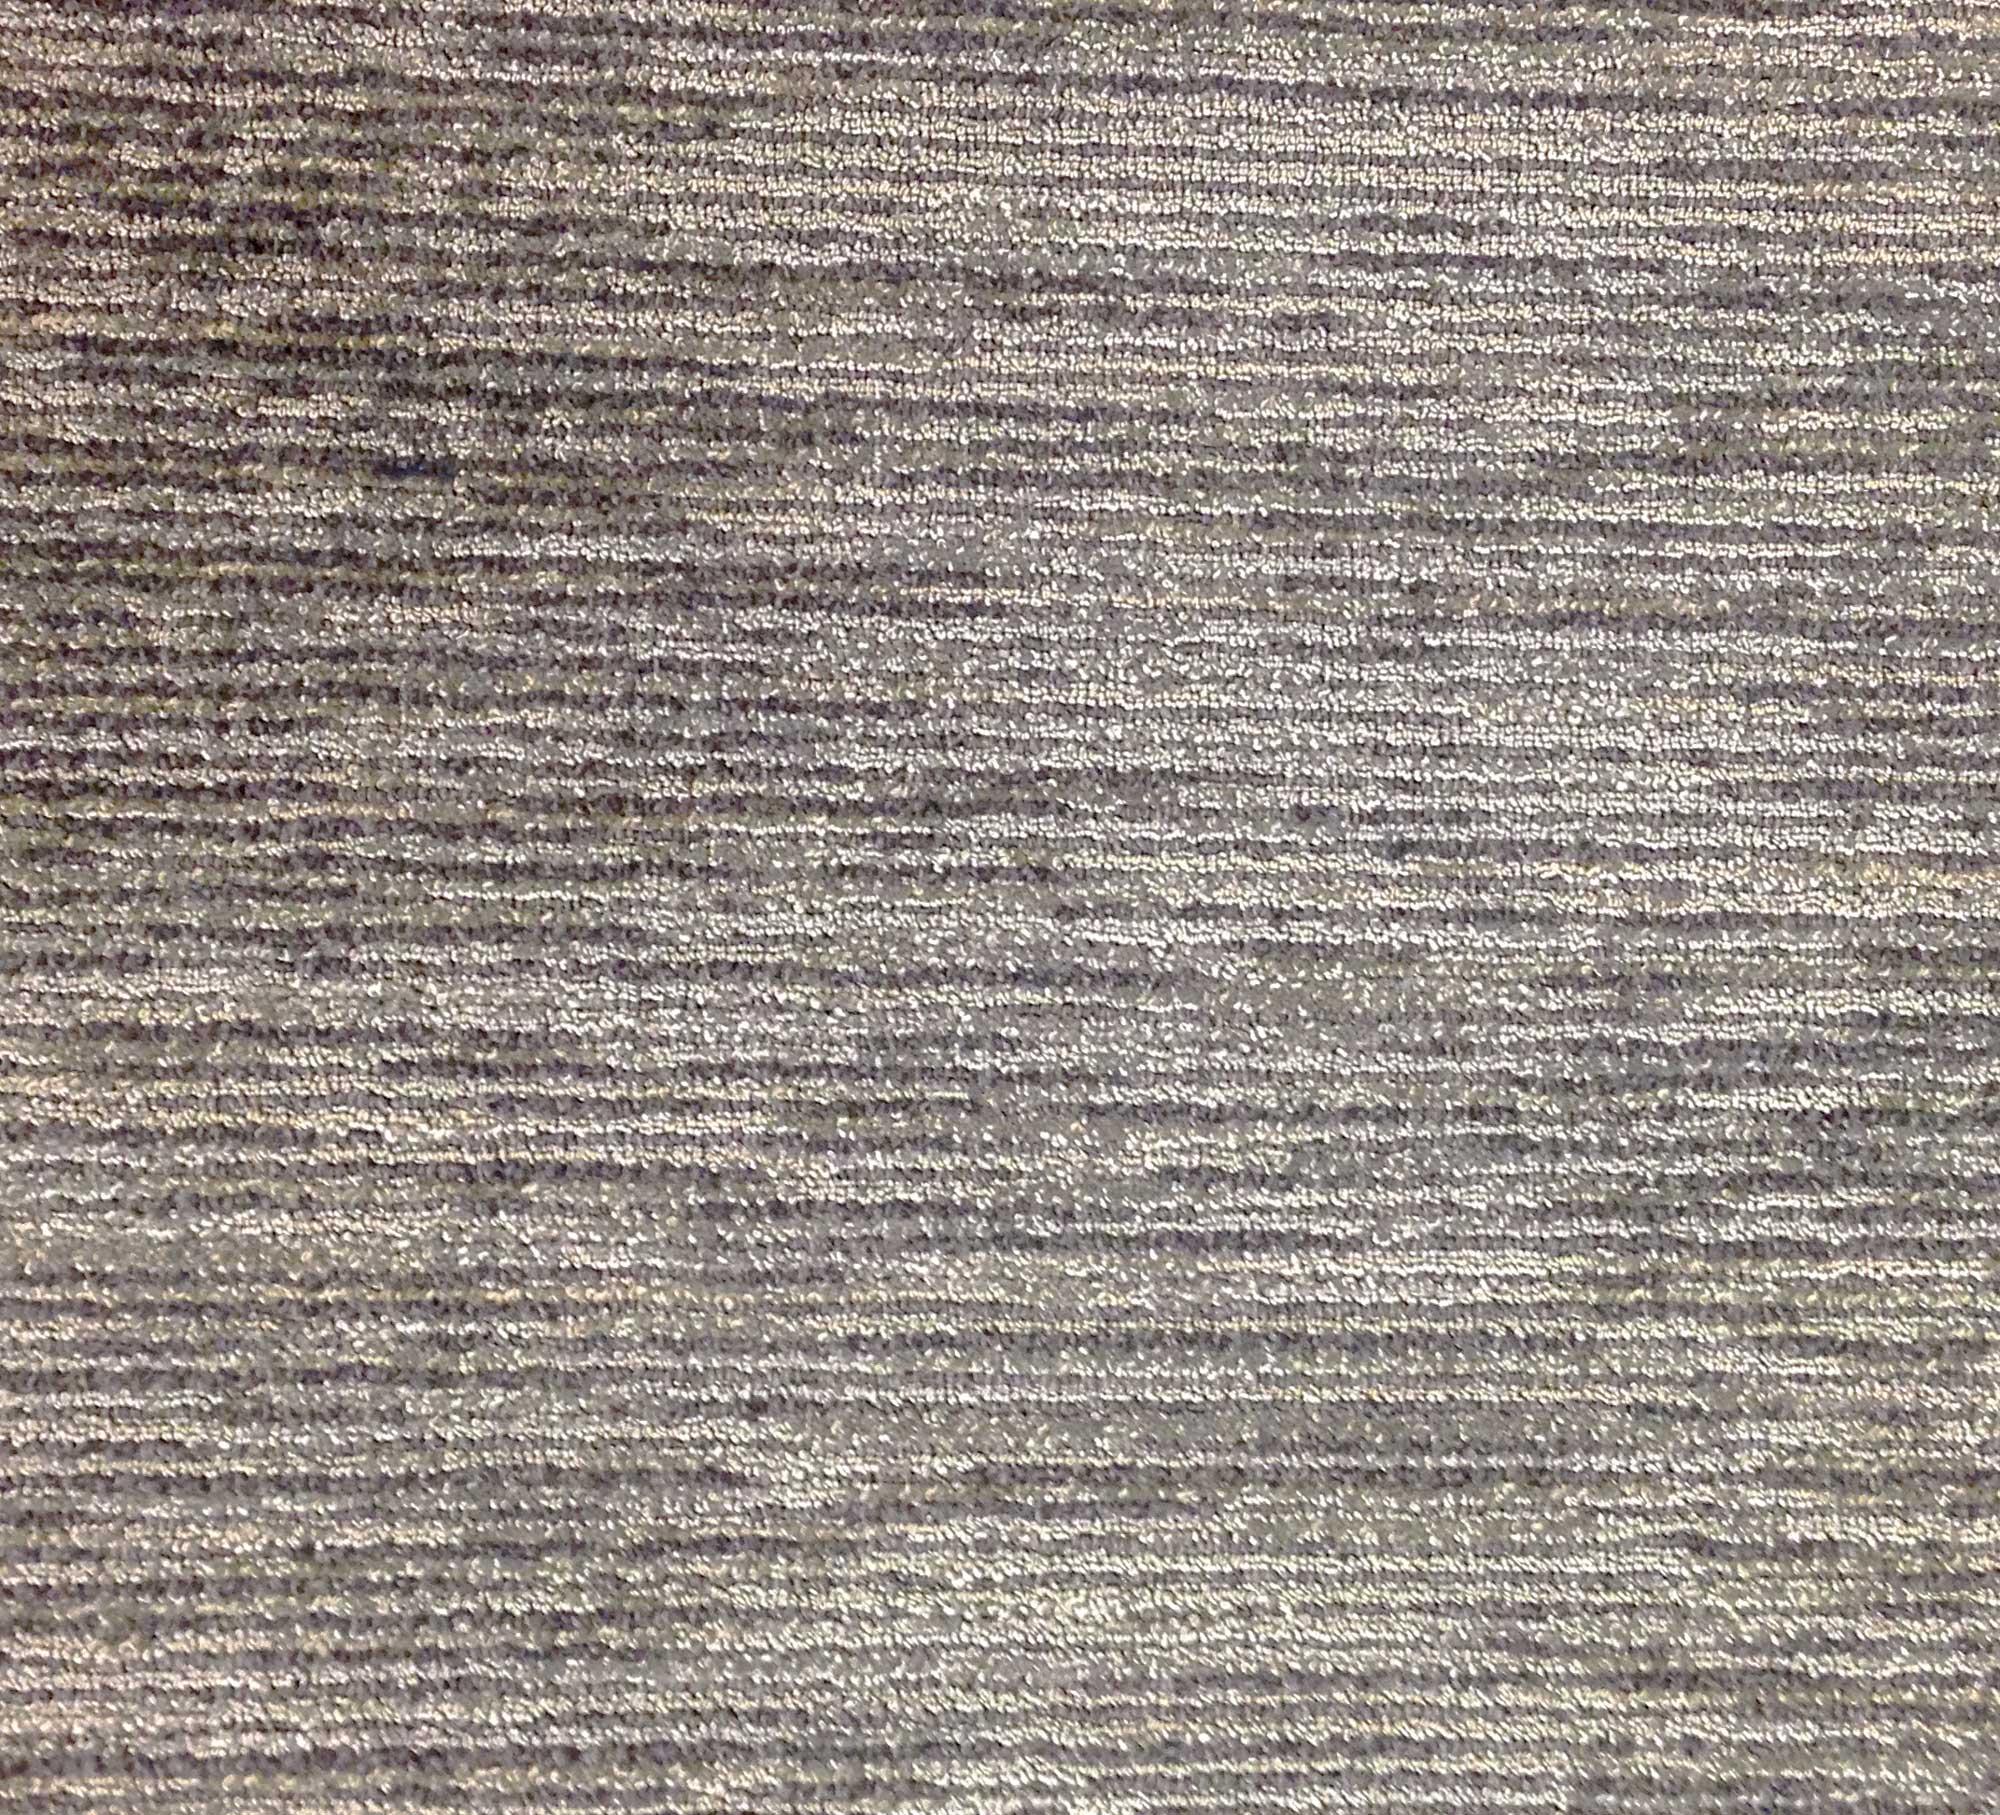 12_Carpet.jpg